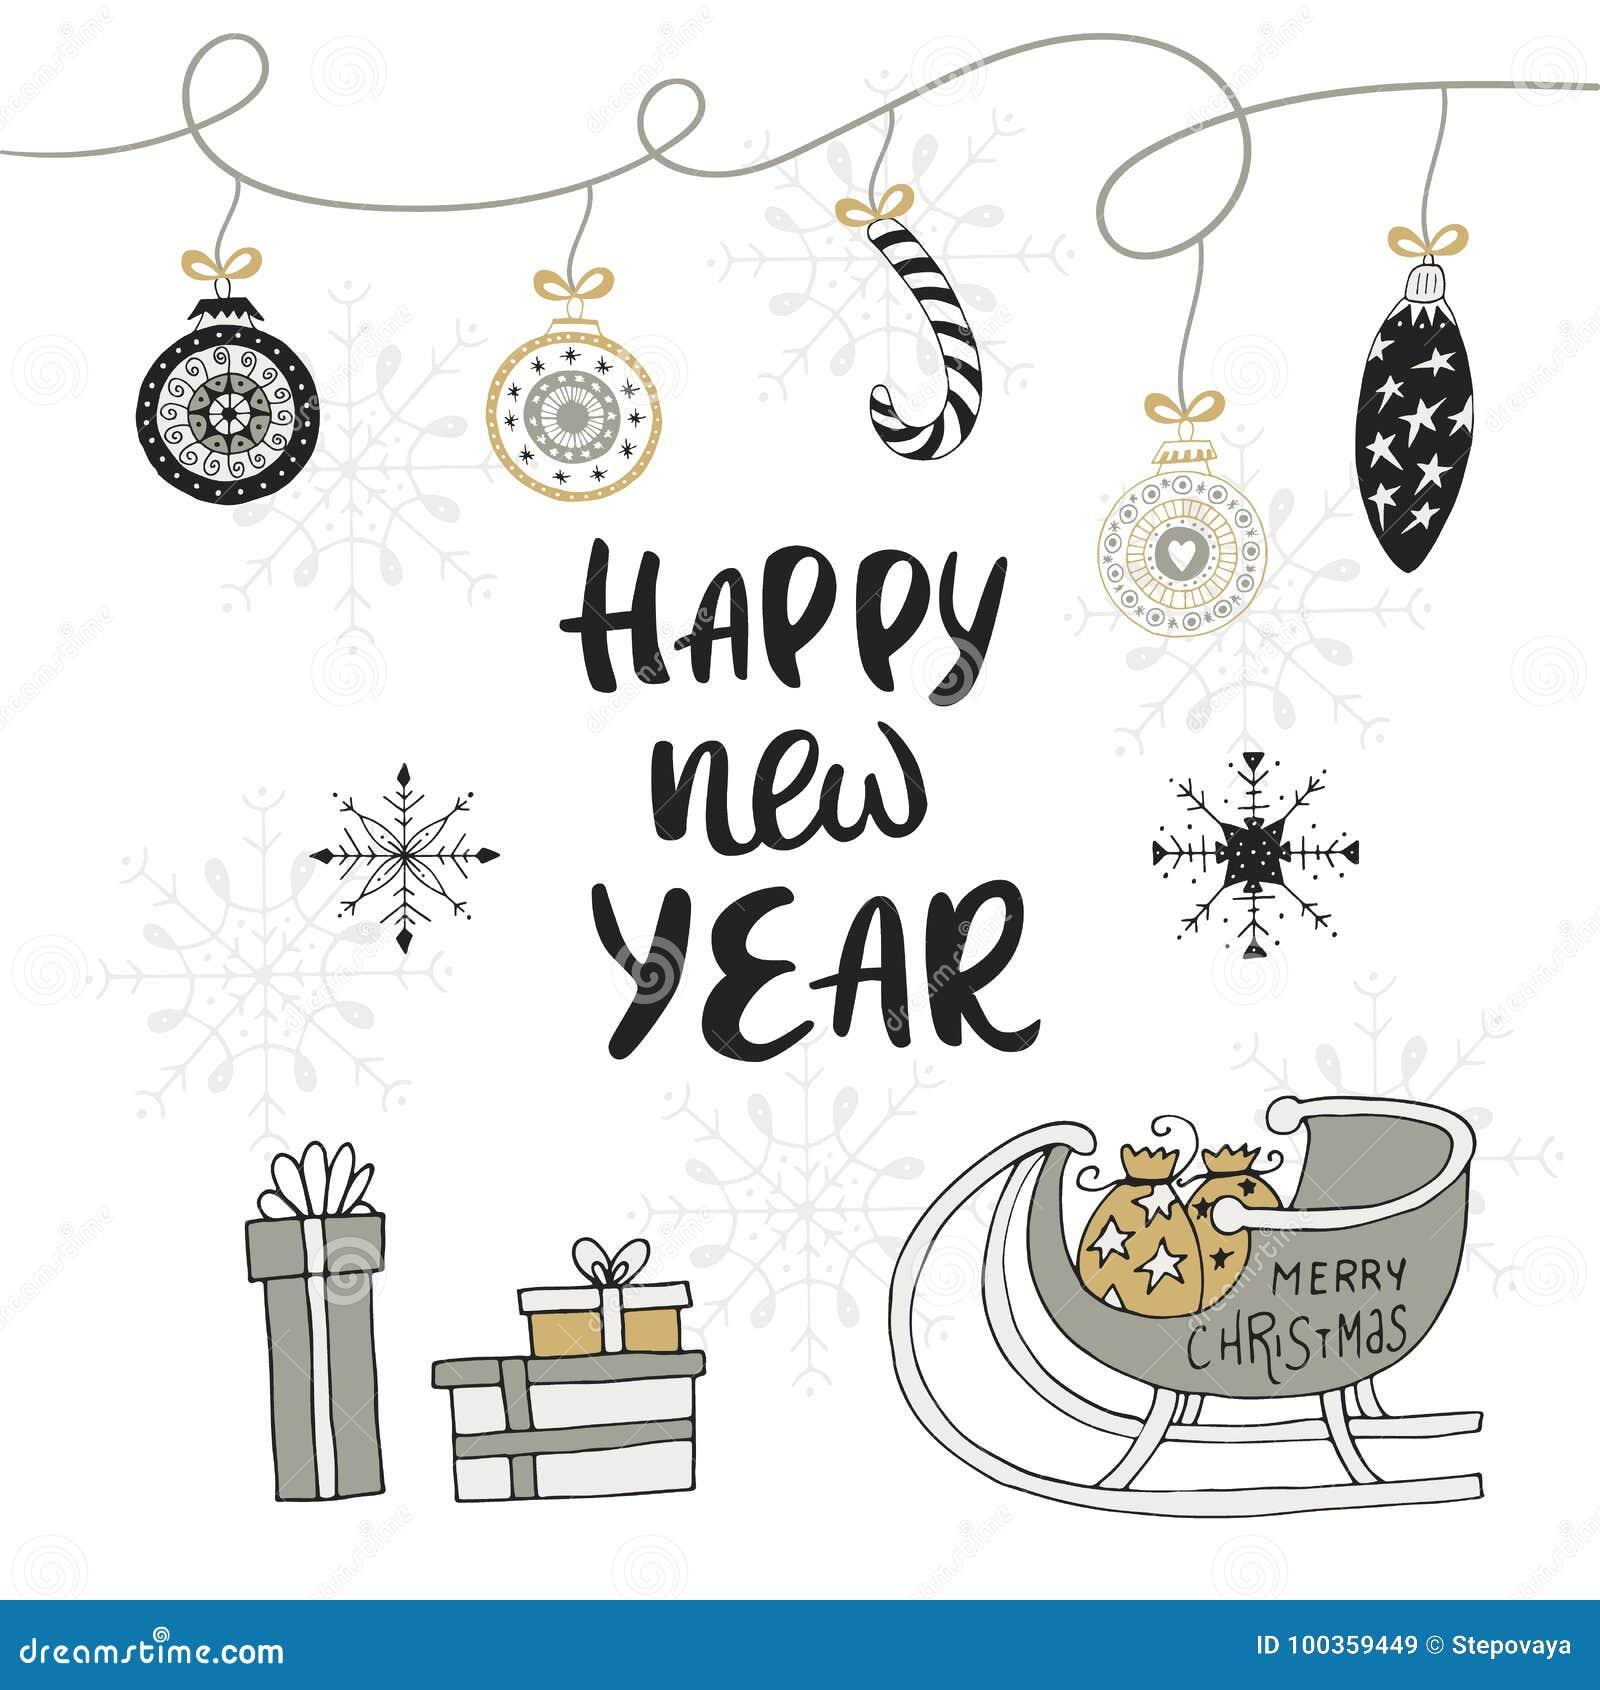 New Years Clip Art - McCoy's Barrelhouse Grill